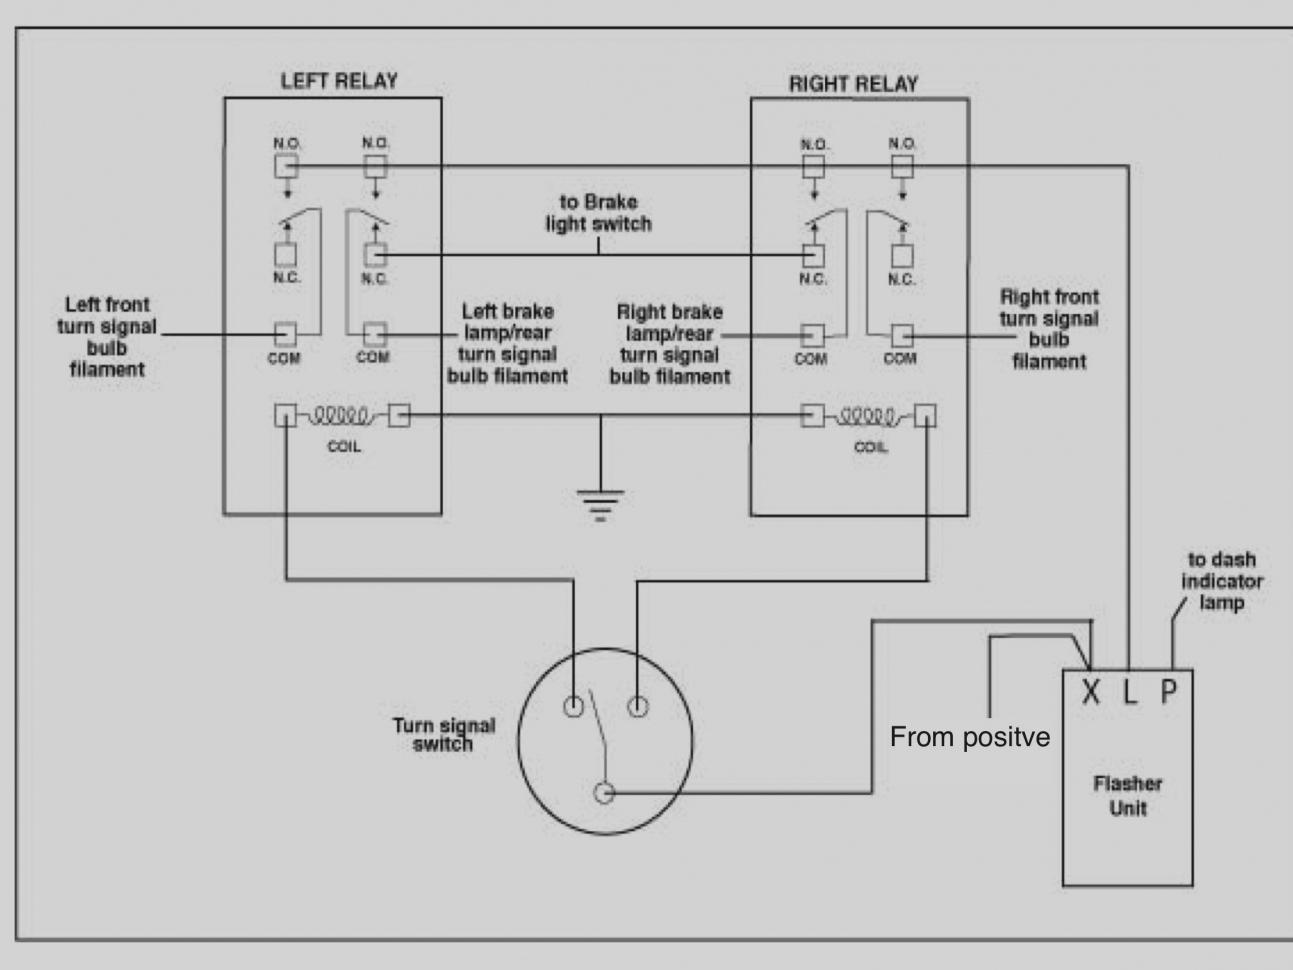 2014 polaris rzr 800 wiring diagram online wiring diagram. Black Bedroom Furniture Sets. Home Design Ideas